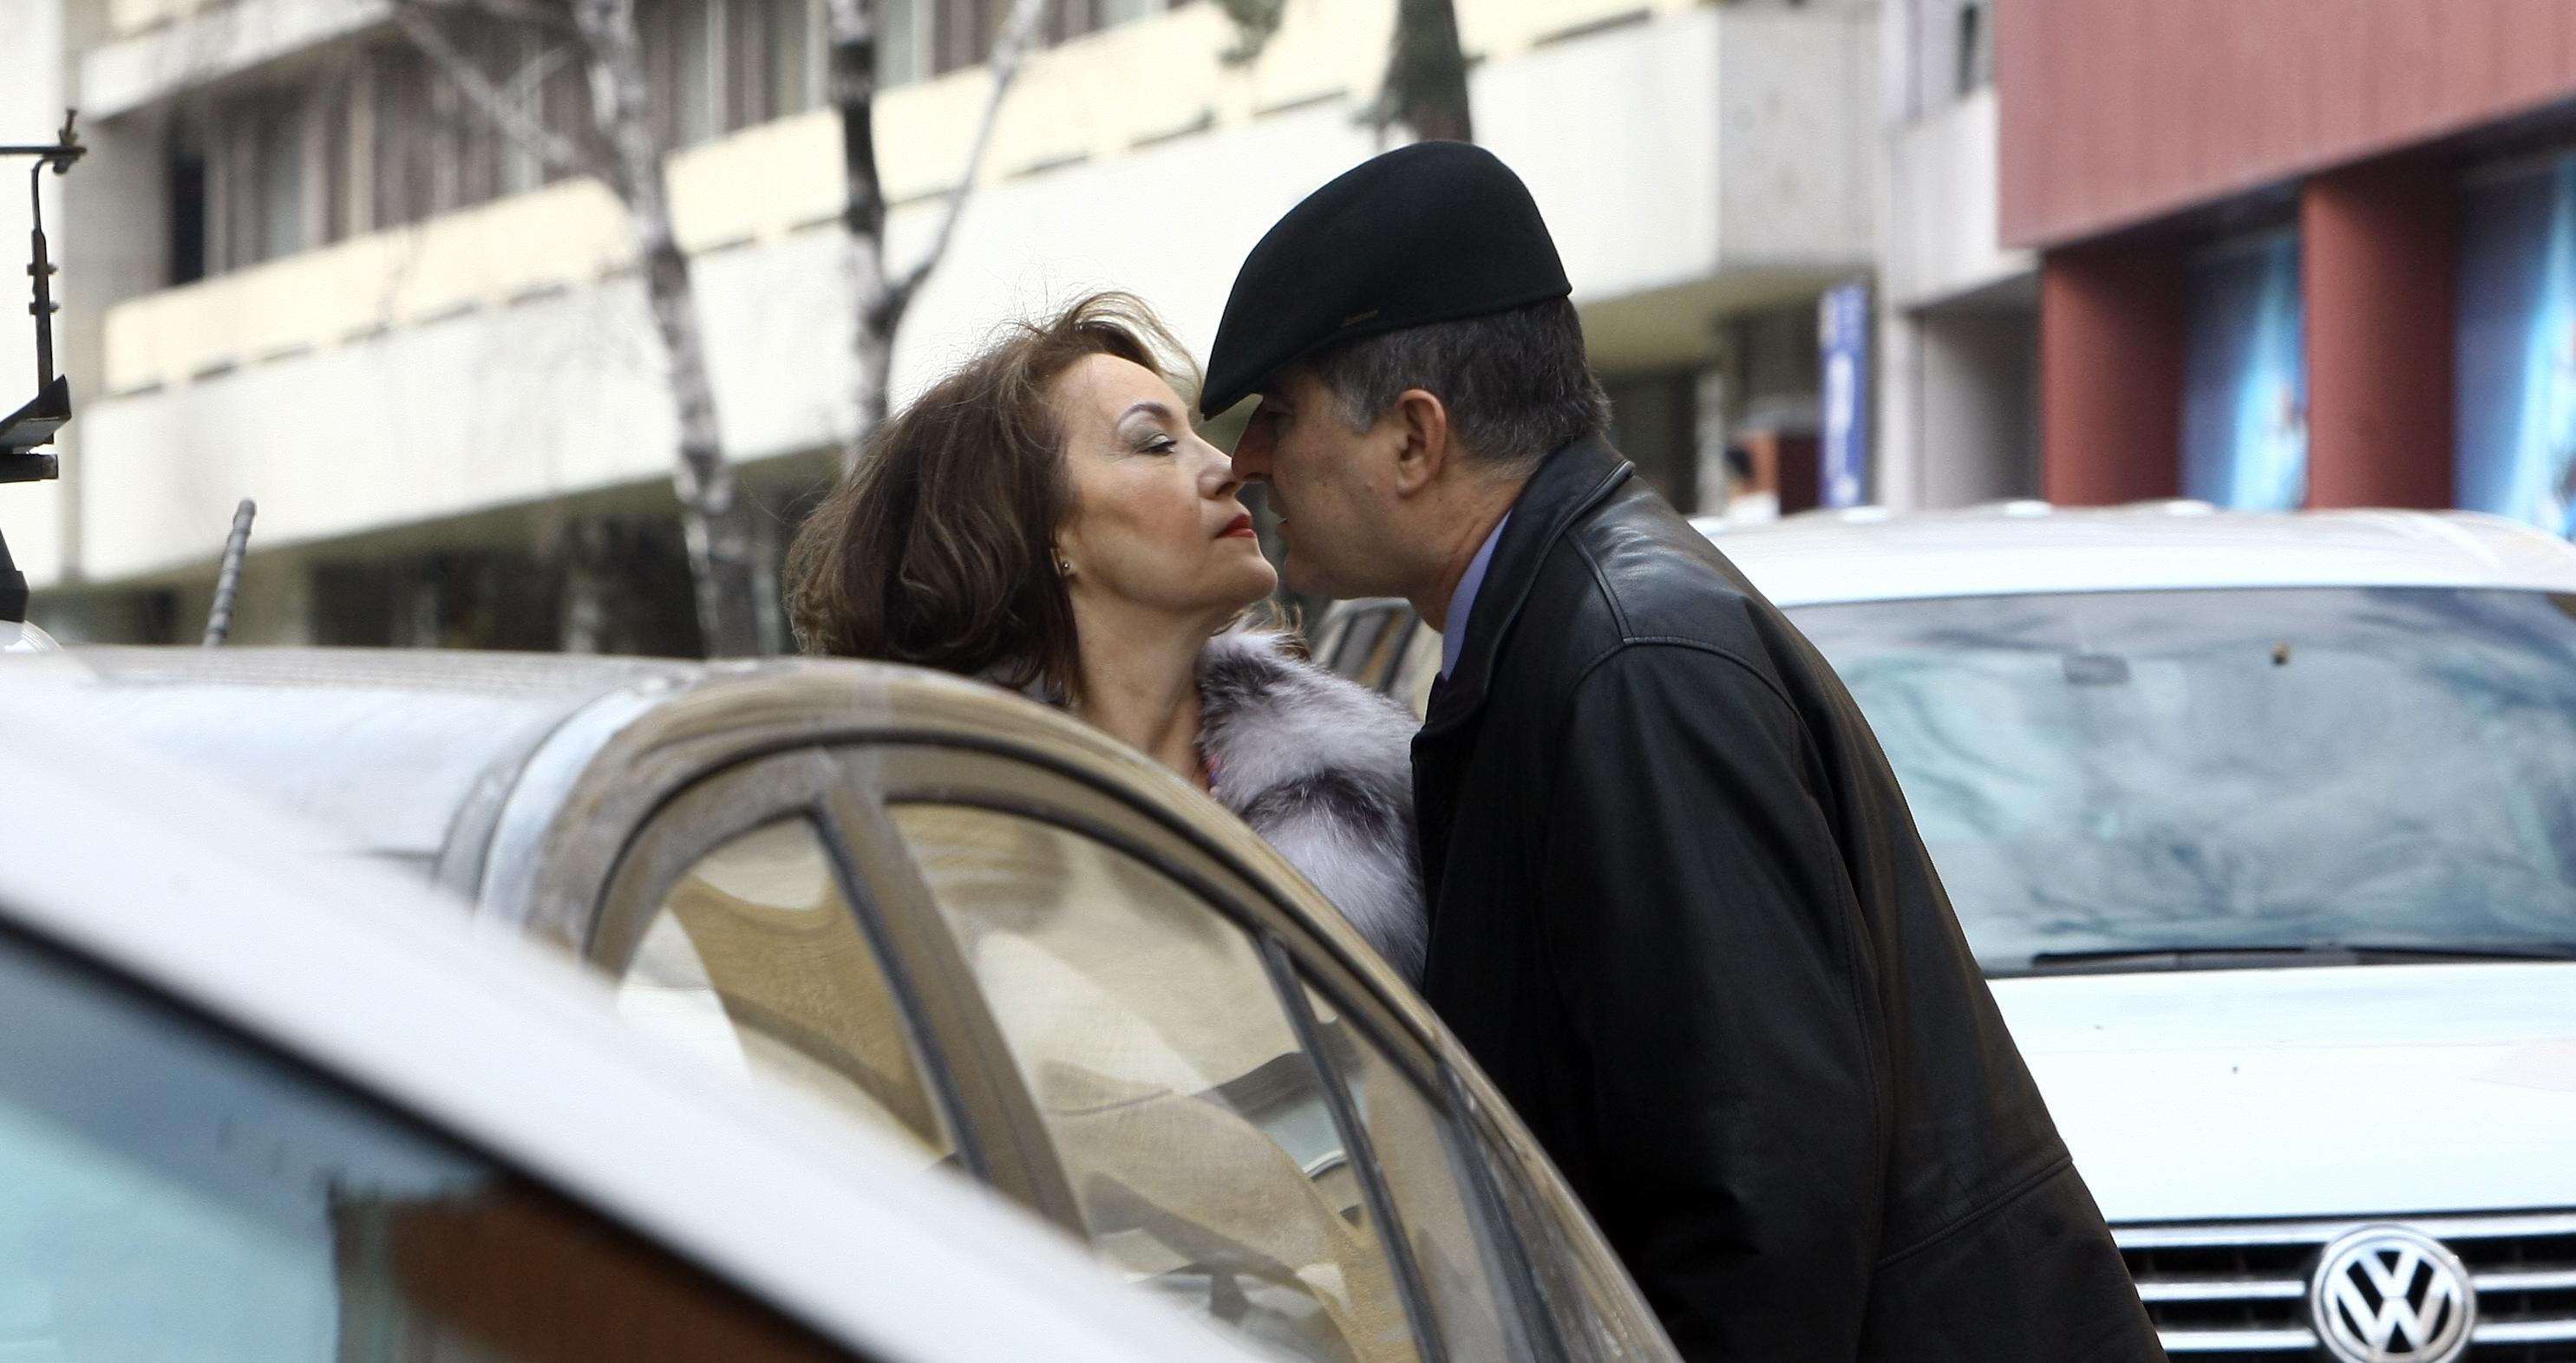 Politicianul, romantic in plina strada cu partenera sa de viata